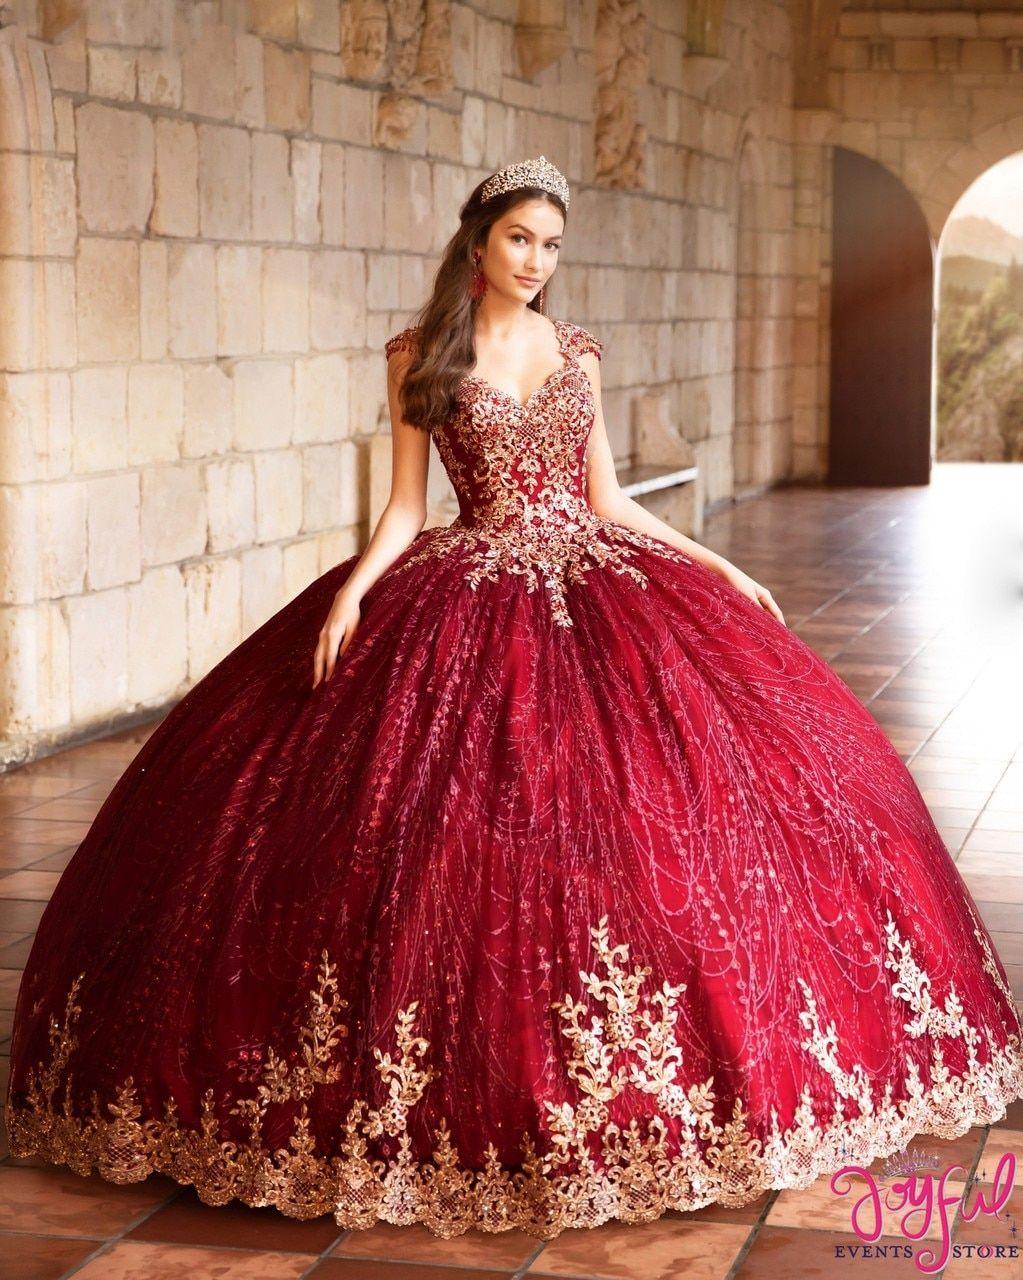 Wine/Gold Quinceanera Dress #PR21964WGD -   15 dress Quinceanera burgundy ideas